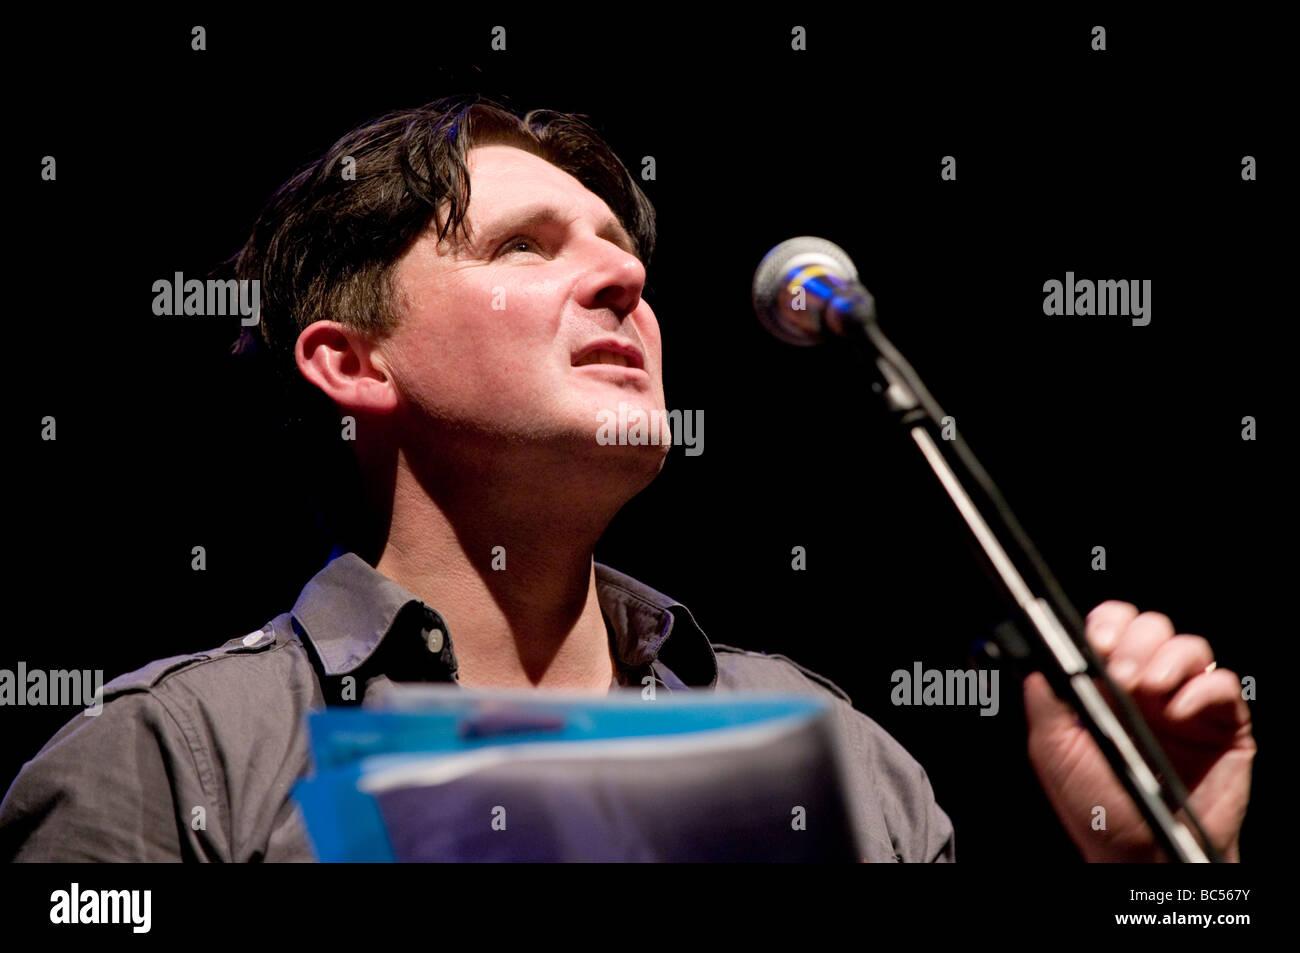 Patrick Jones radical left wing socialist welsh poet performing at Aberystwyth Arts Centre 14 june 2009 - Stock Image